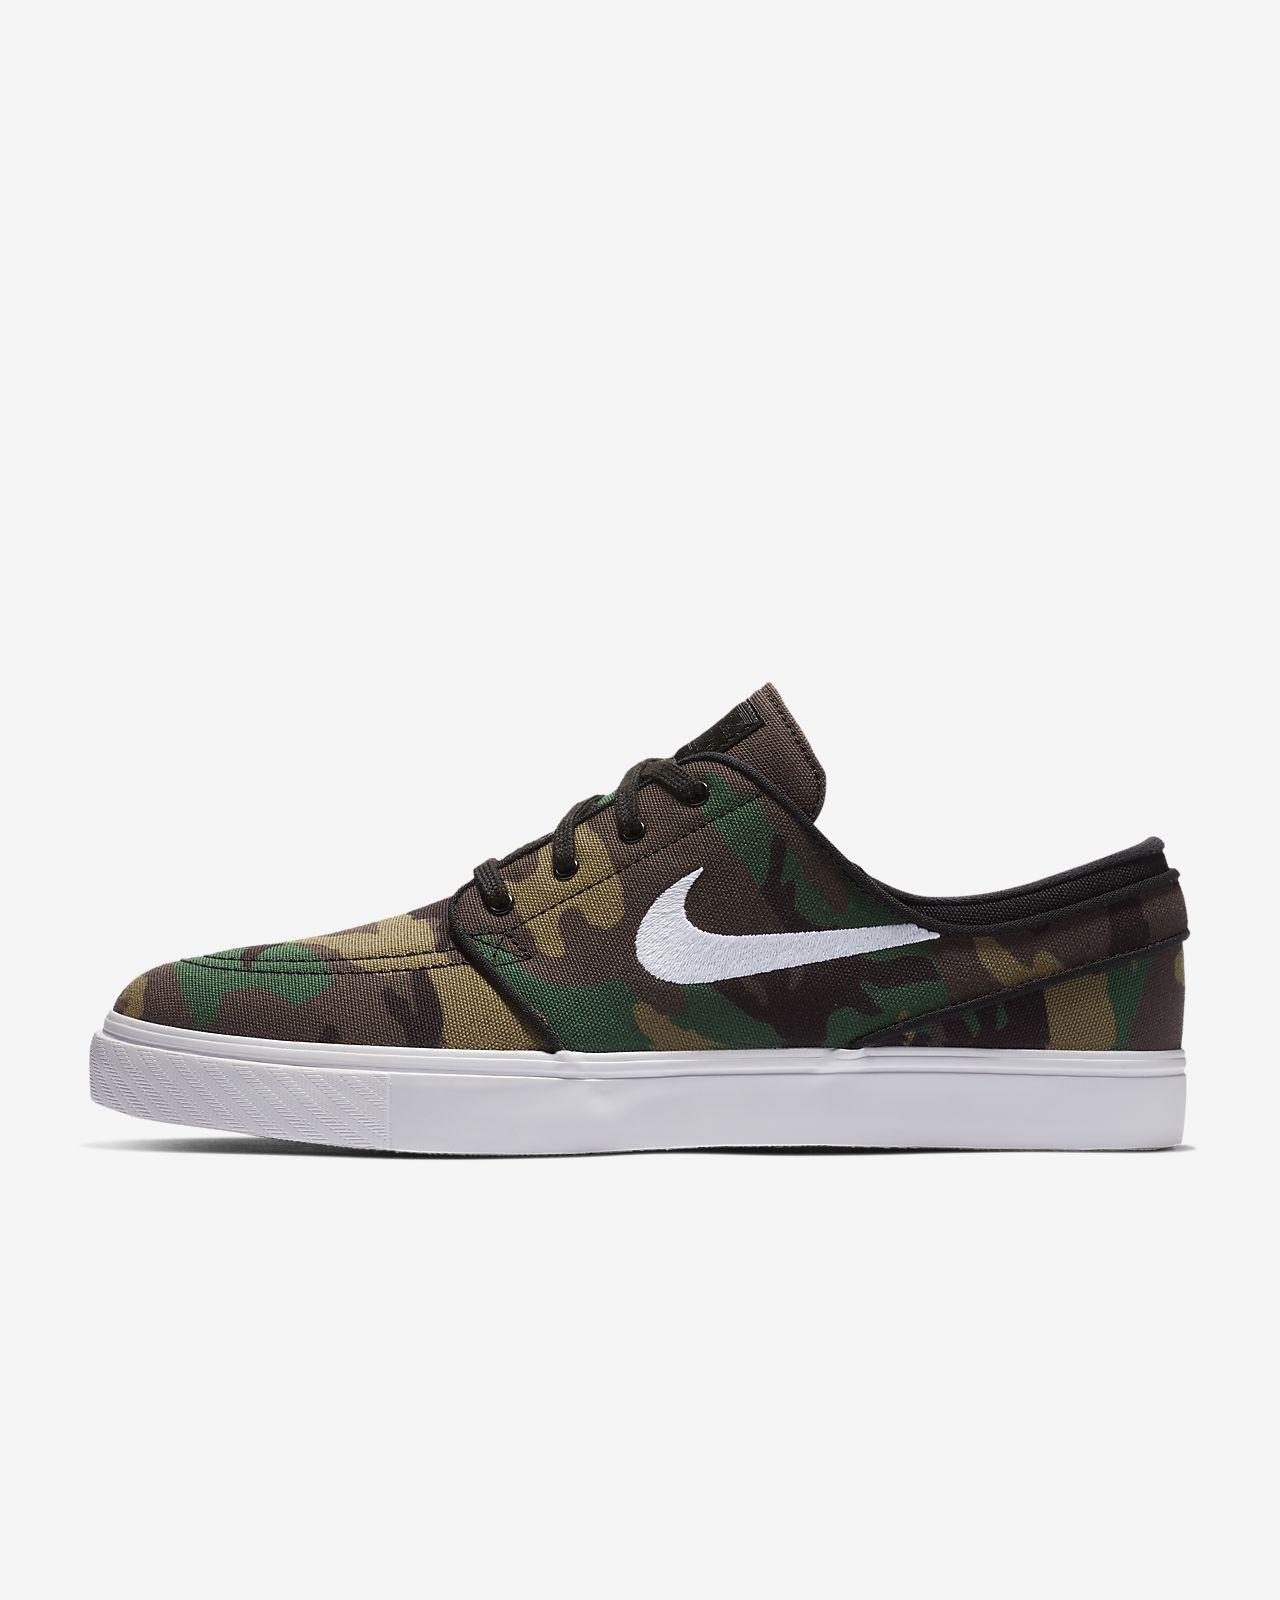 492ddb824b4 ... Calzado de skateboarding para hombre Nike SB Zoom Stefan Janoski Canvas